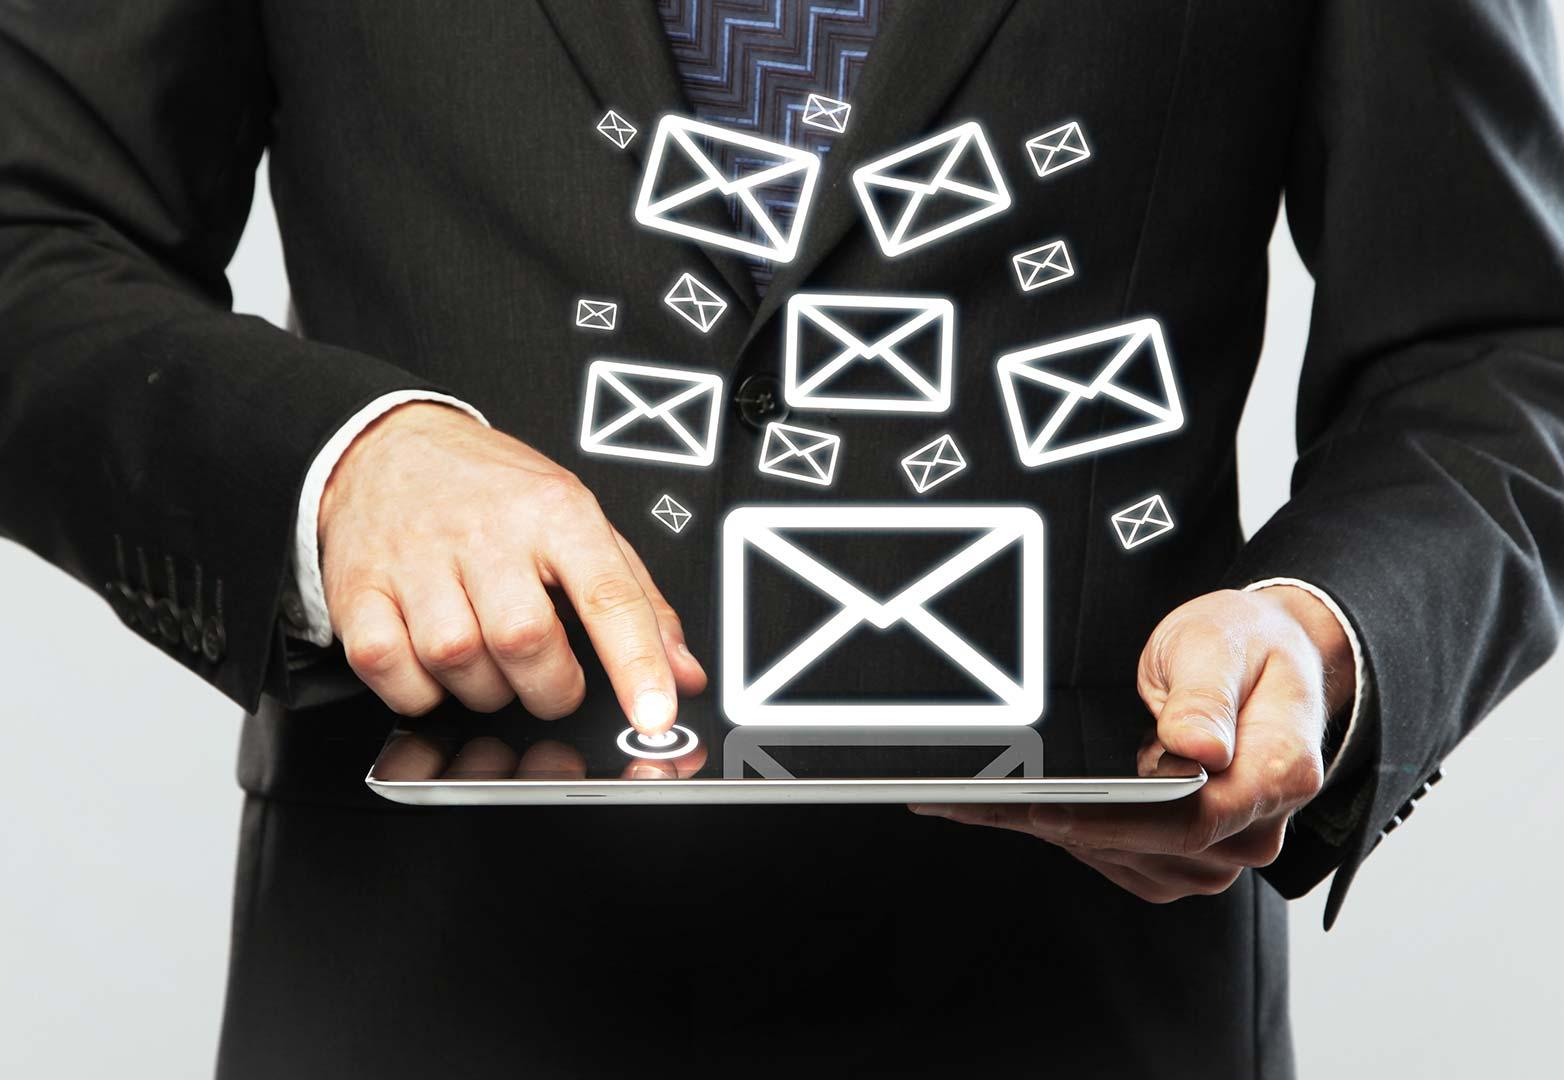 E-mail рассылка по своей базе: что и как